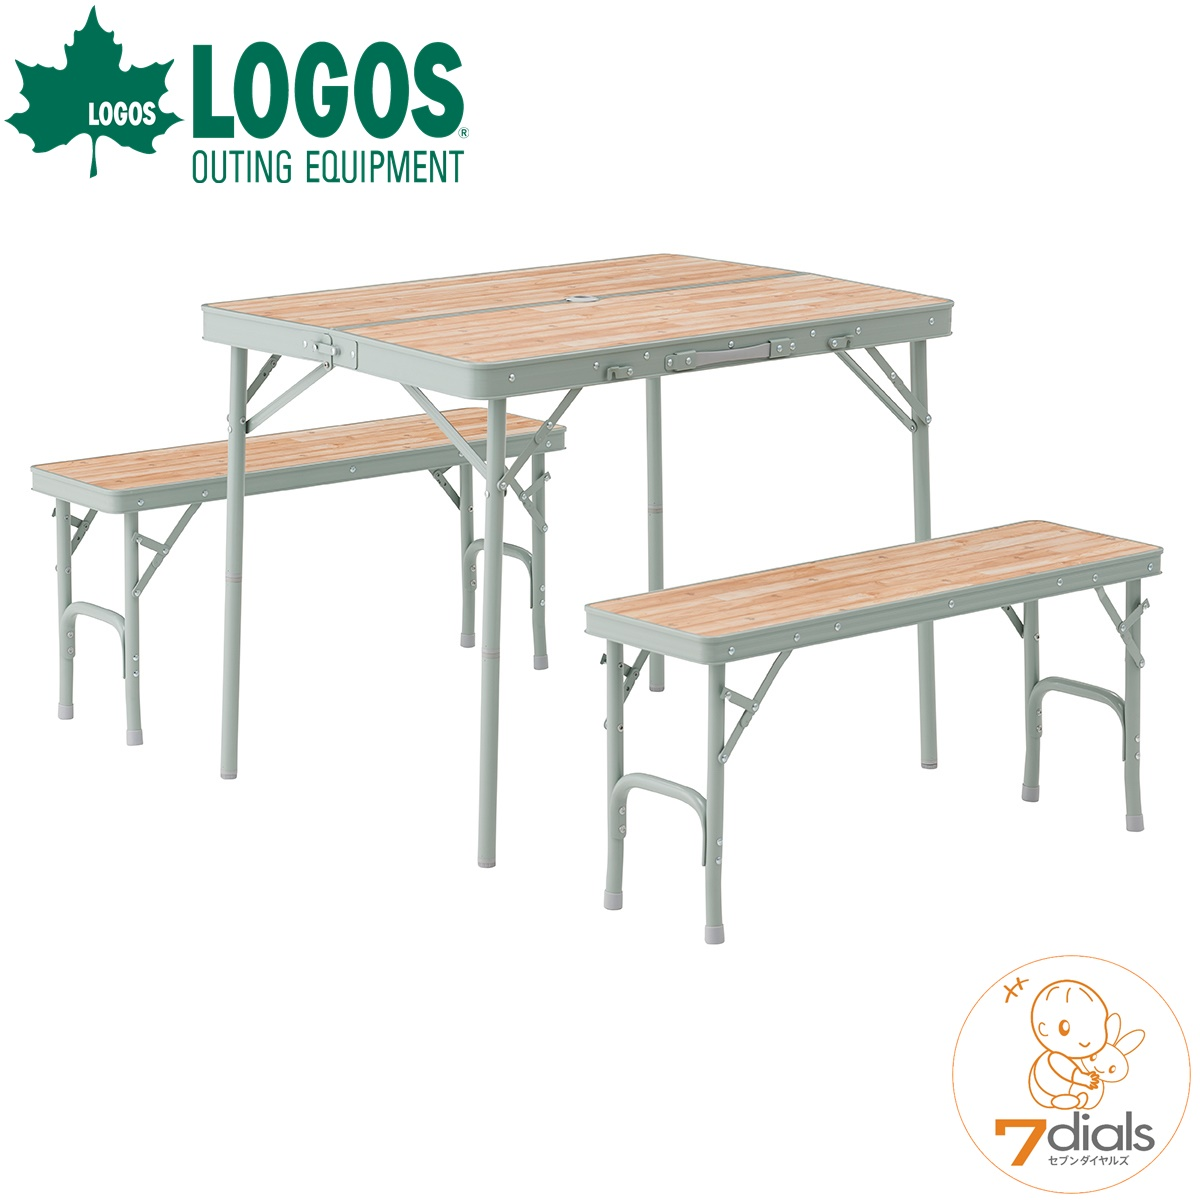 LOGOS/ロゴス LOGOS Life ベンチテーブルセット4 家族4人で使える折れ脚テーブルとベンチシート2台のセット 高さ2段階 ハイポジション、ローポジション対応 二つ折りテーブル【あす楽_土曜営業】【送料無料】